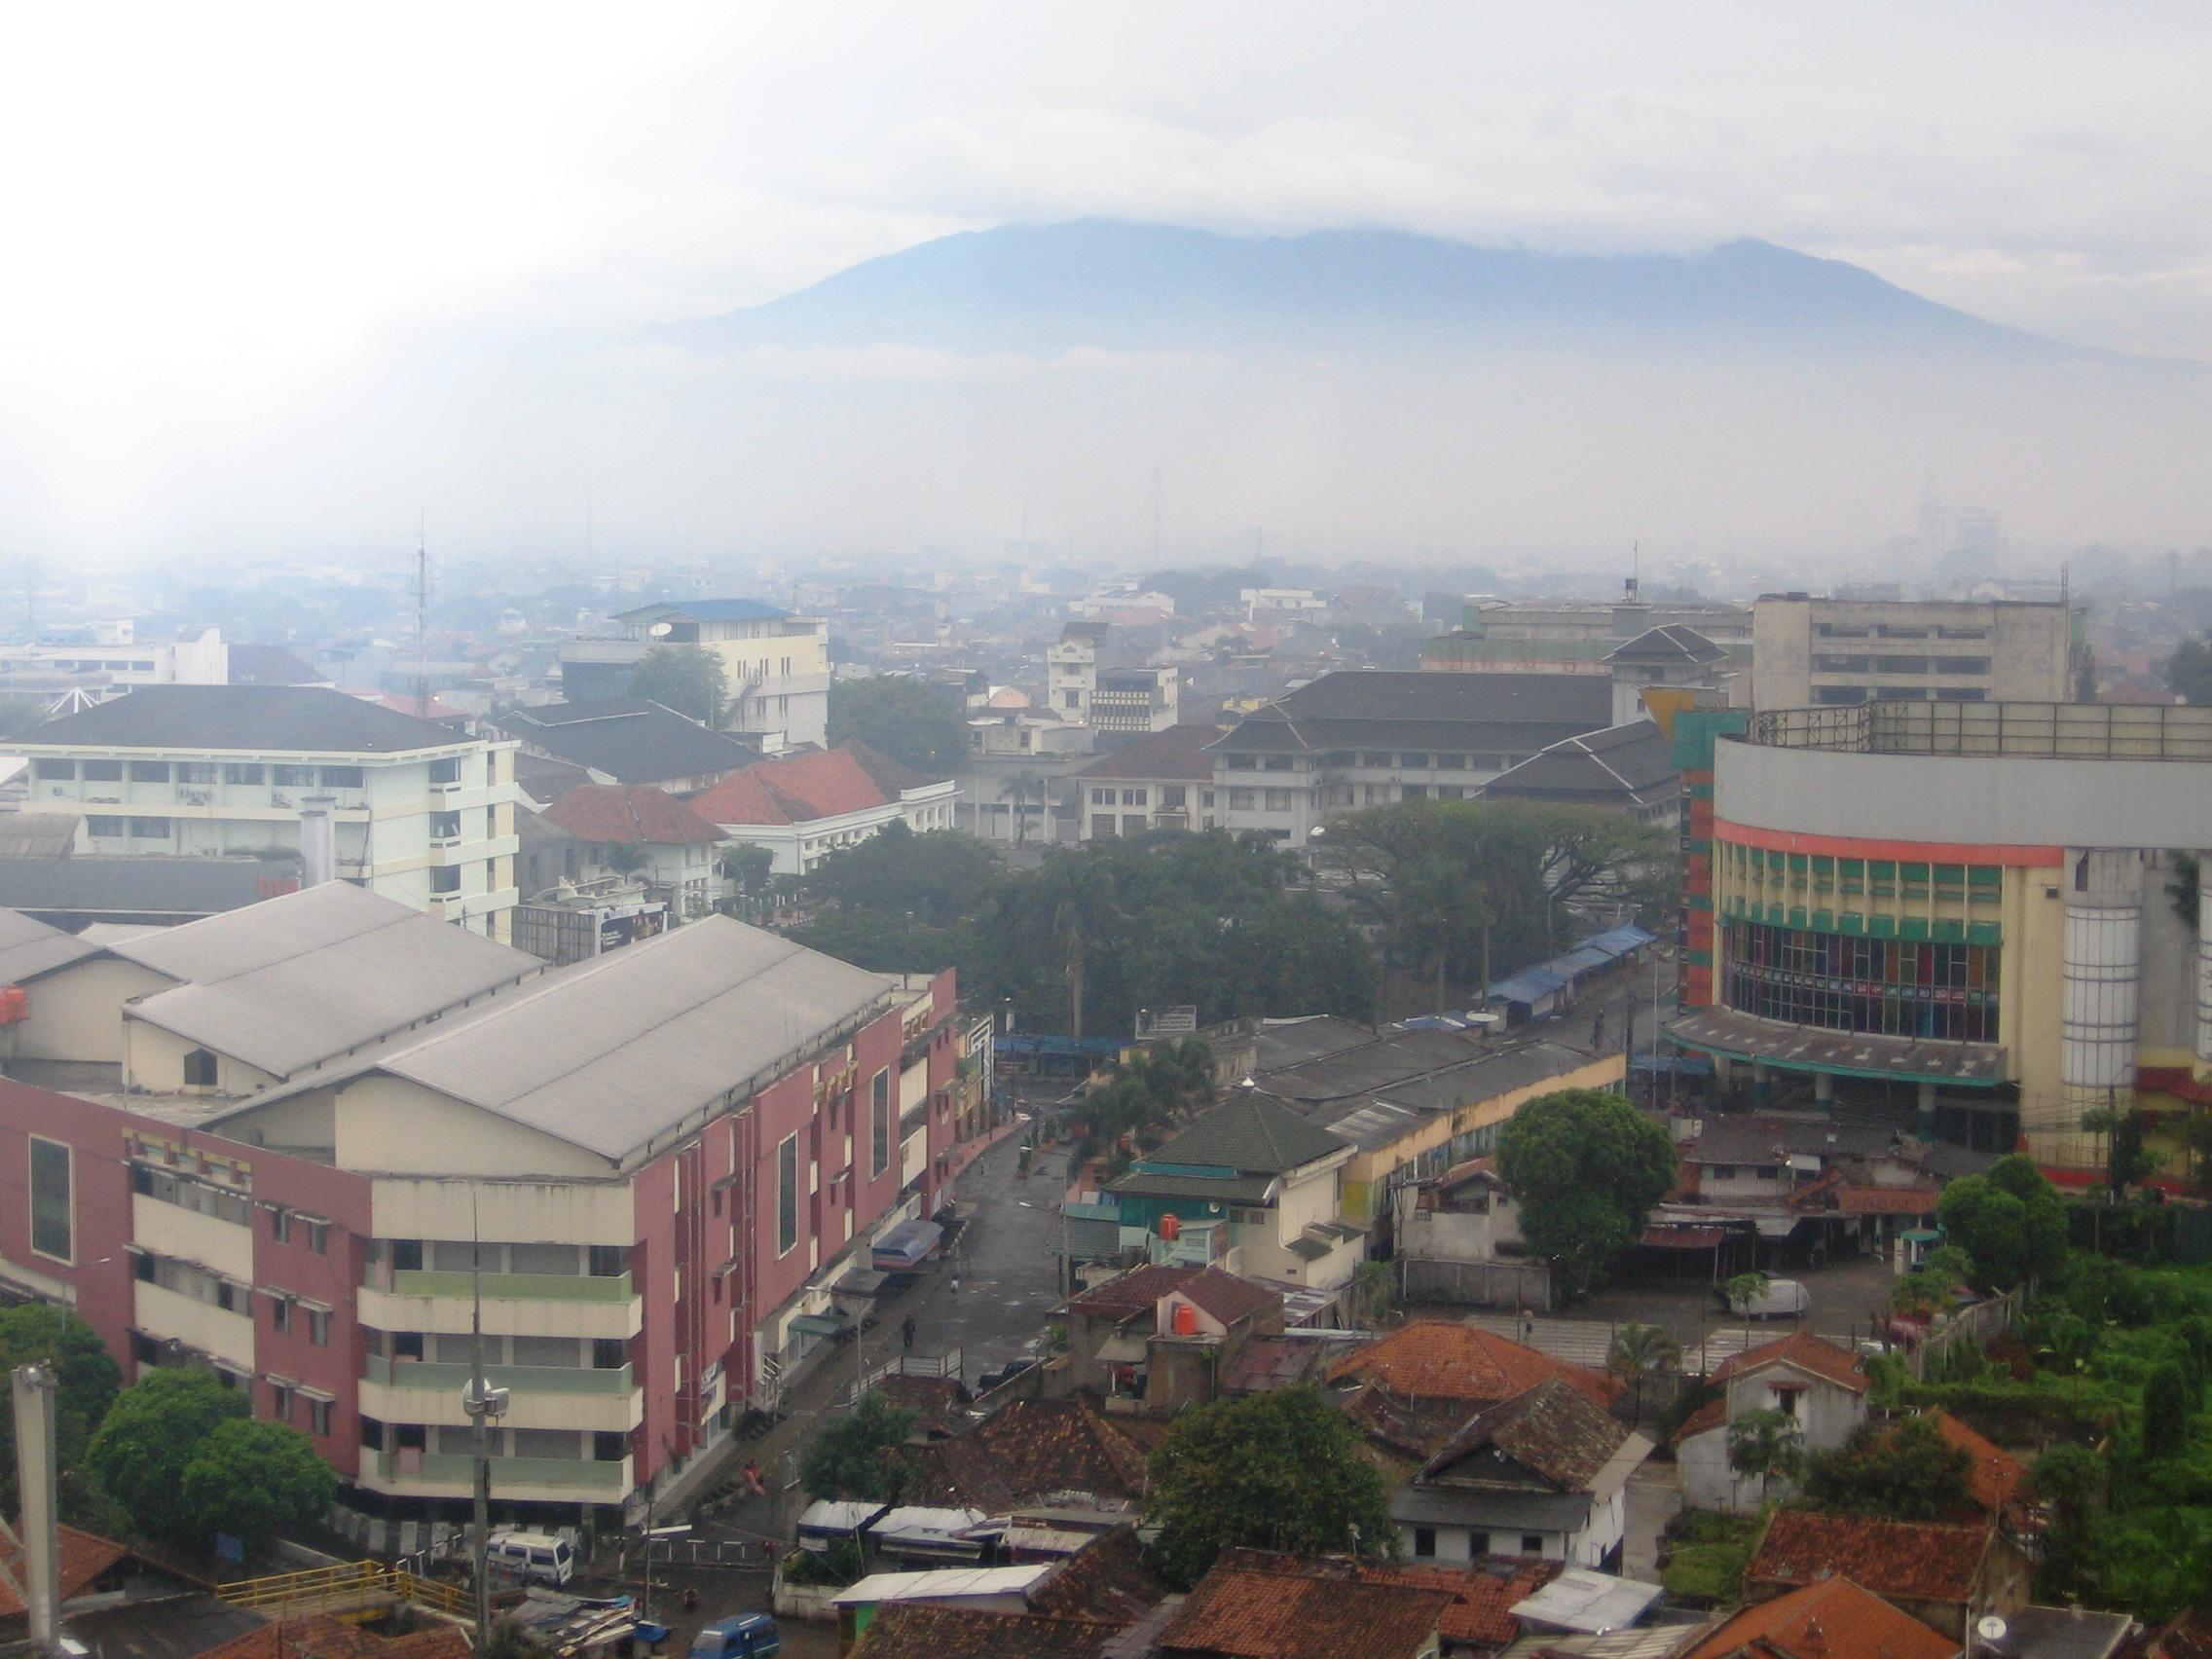 Bandung, Parisj van Java   Asambackpacker01's Blog